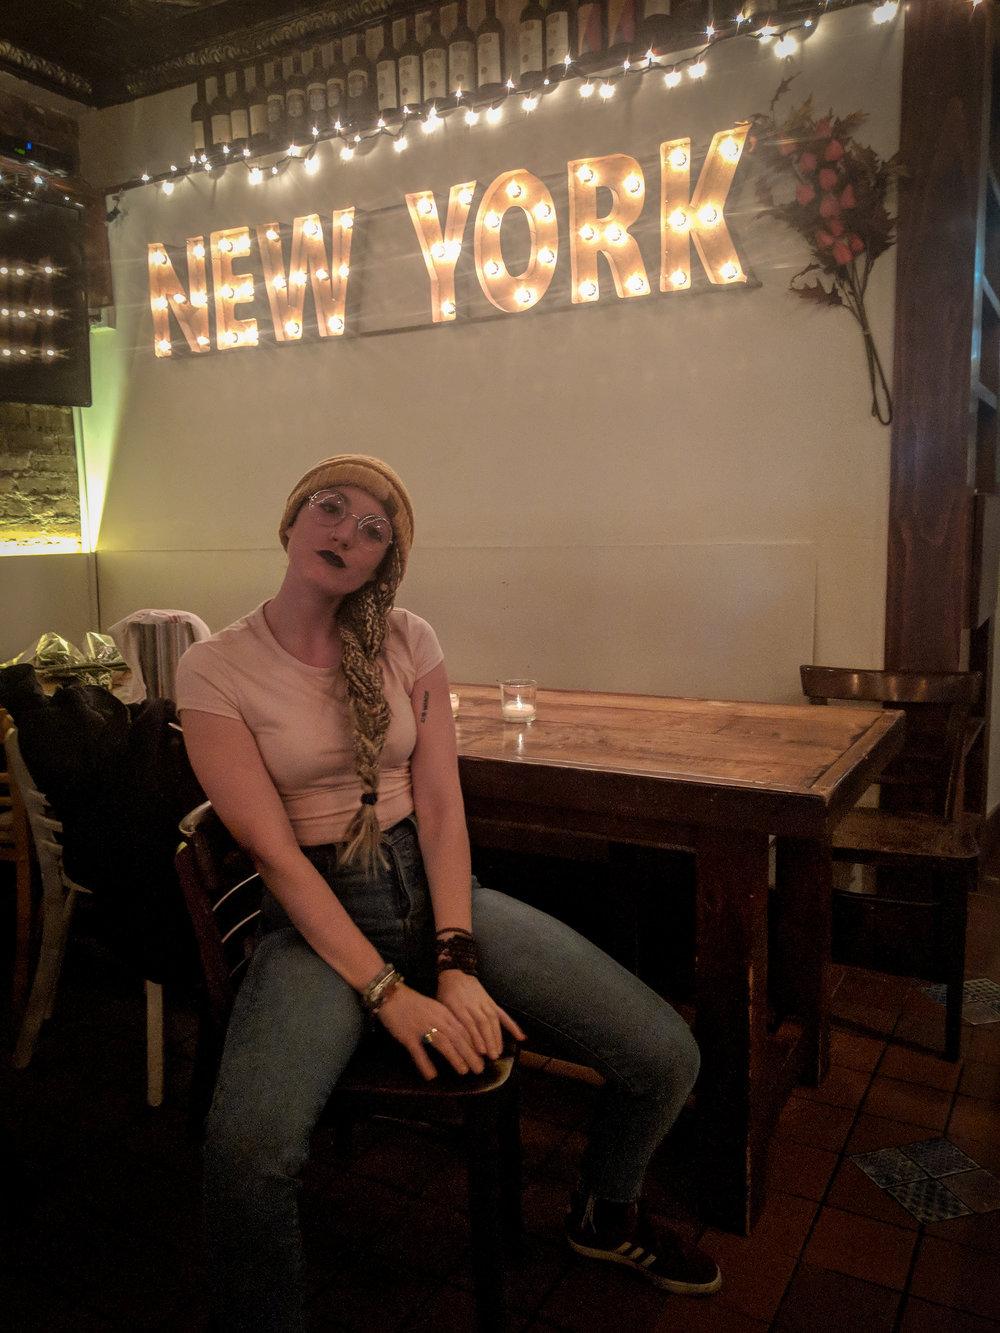 NYC bishhhhhh